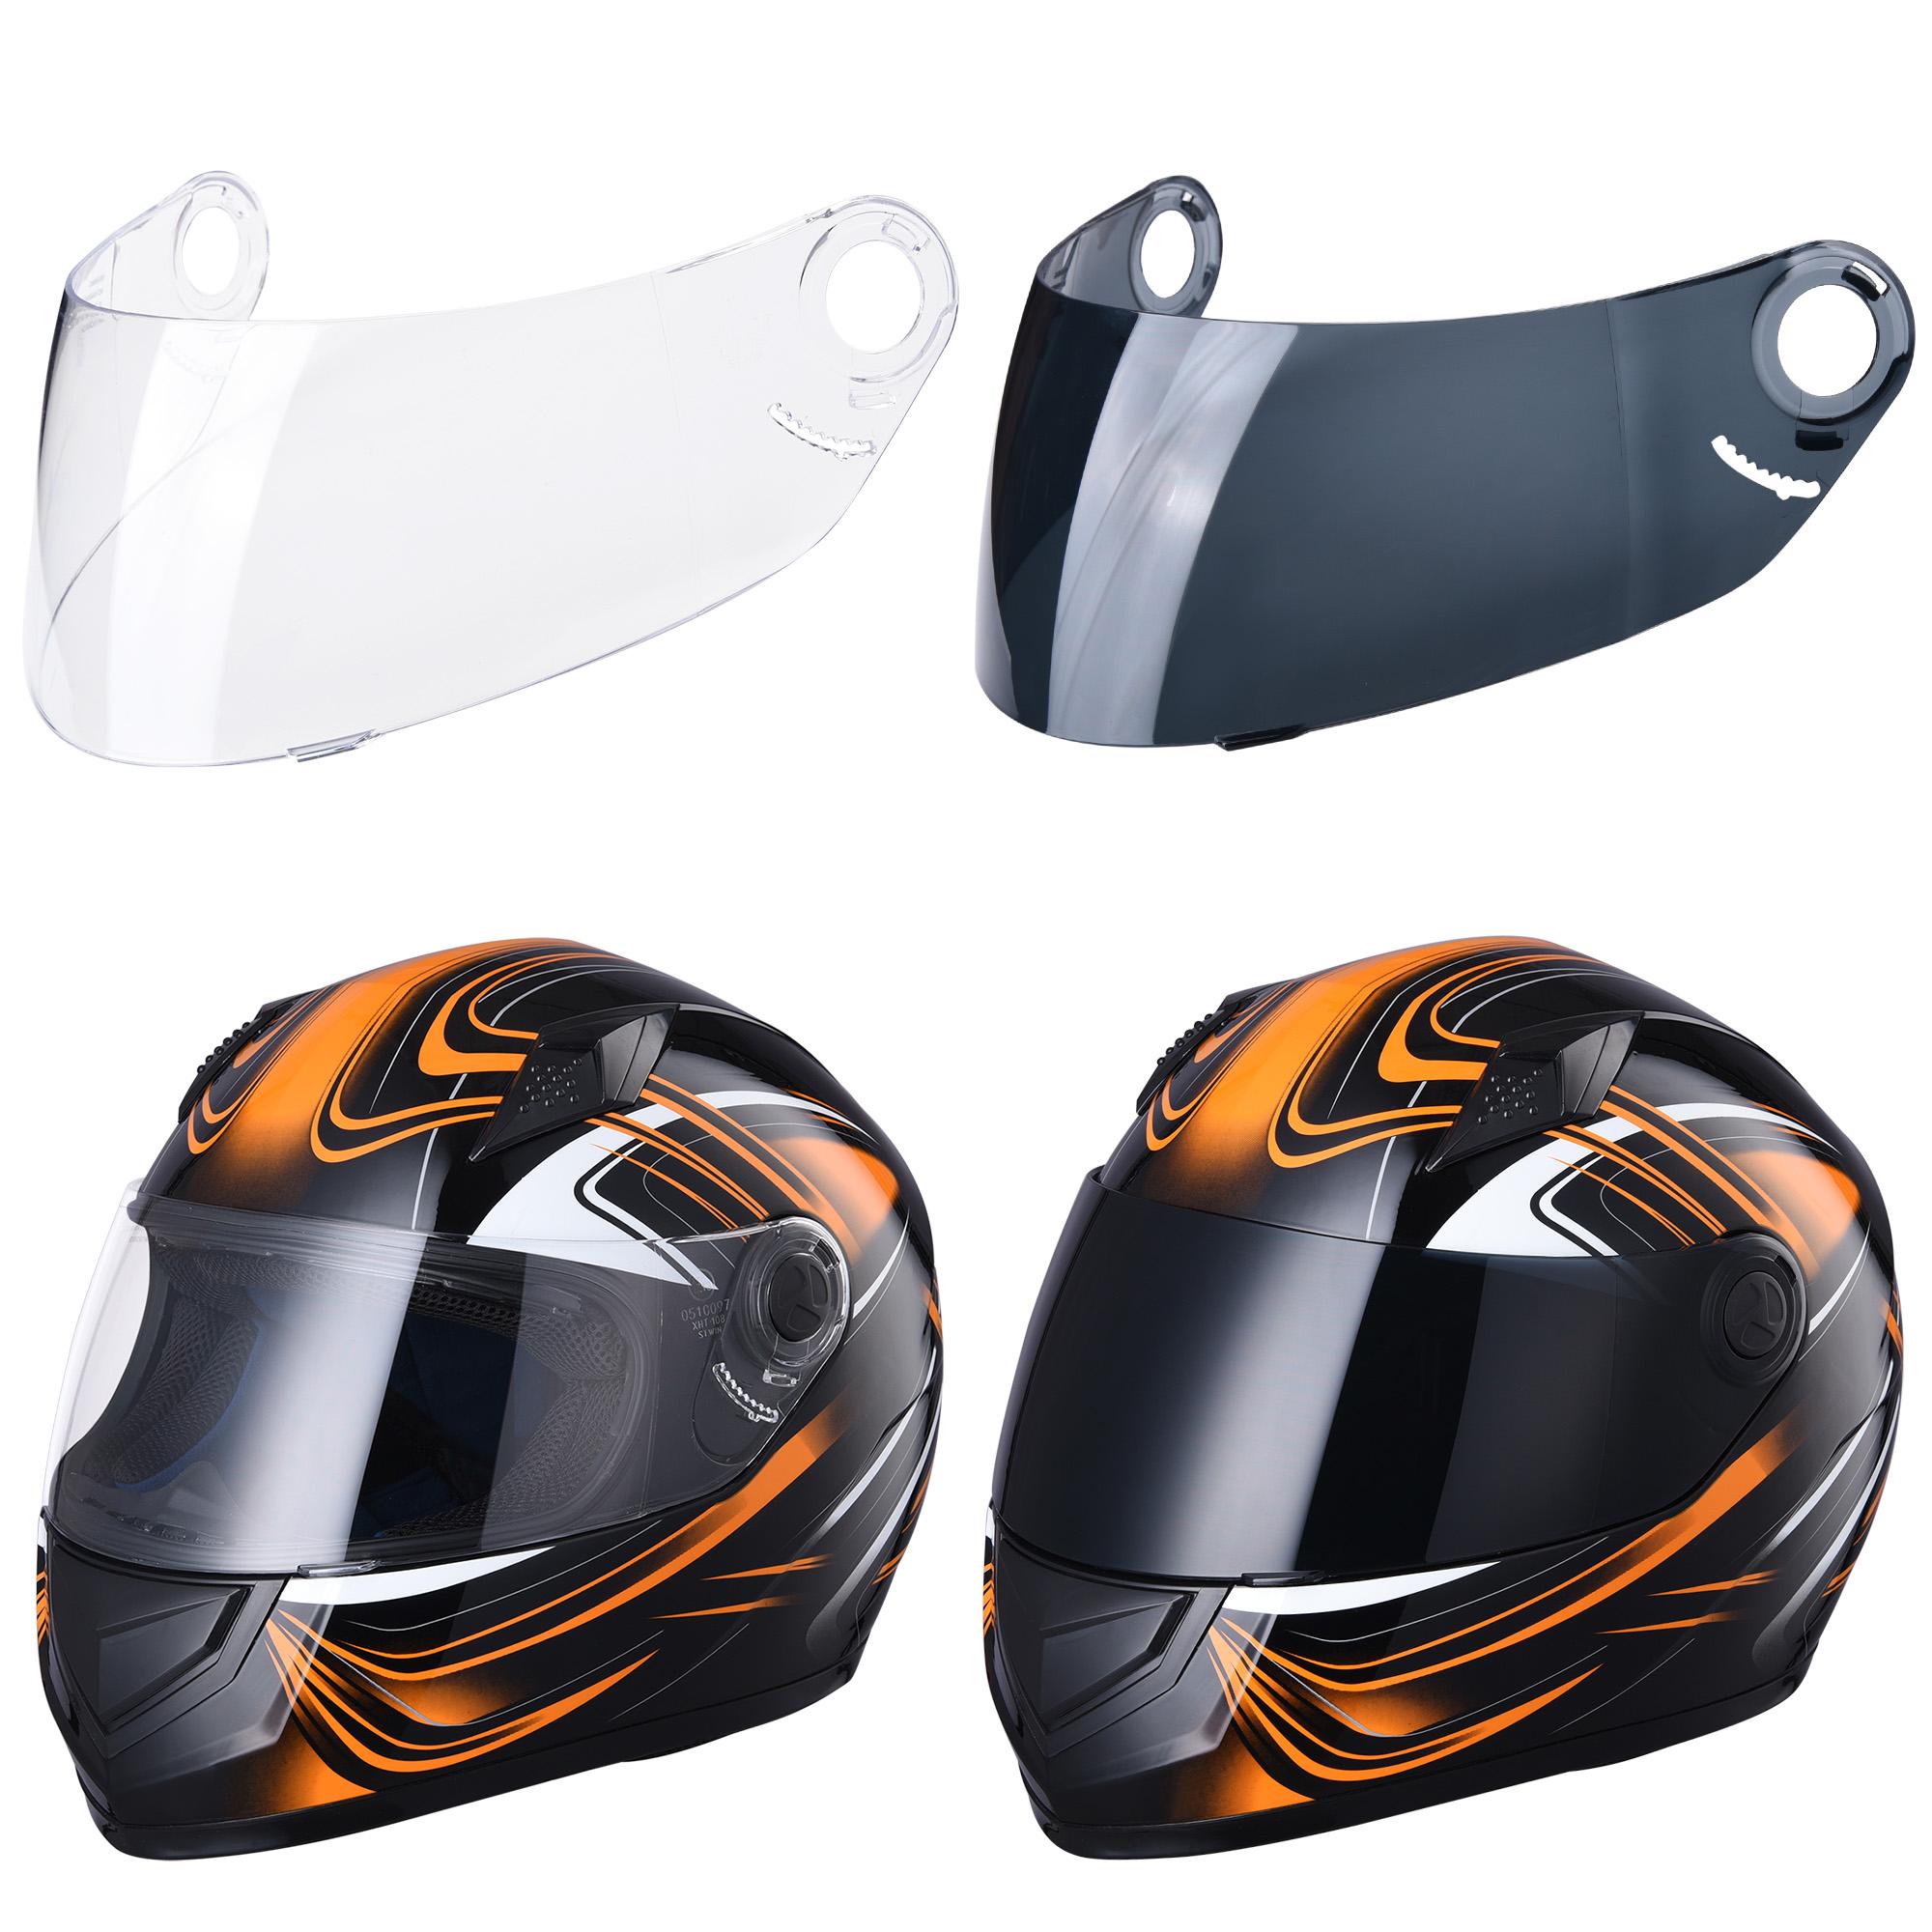 miniature 79 - AHR K12 Full Face Motorcycle Helmet DOT Air Vents Clear Visor Racing S M L XL